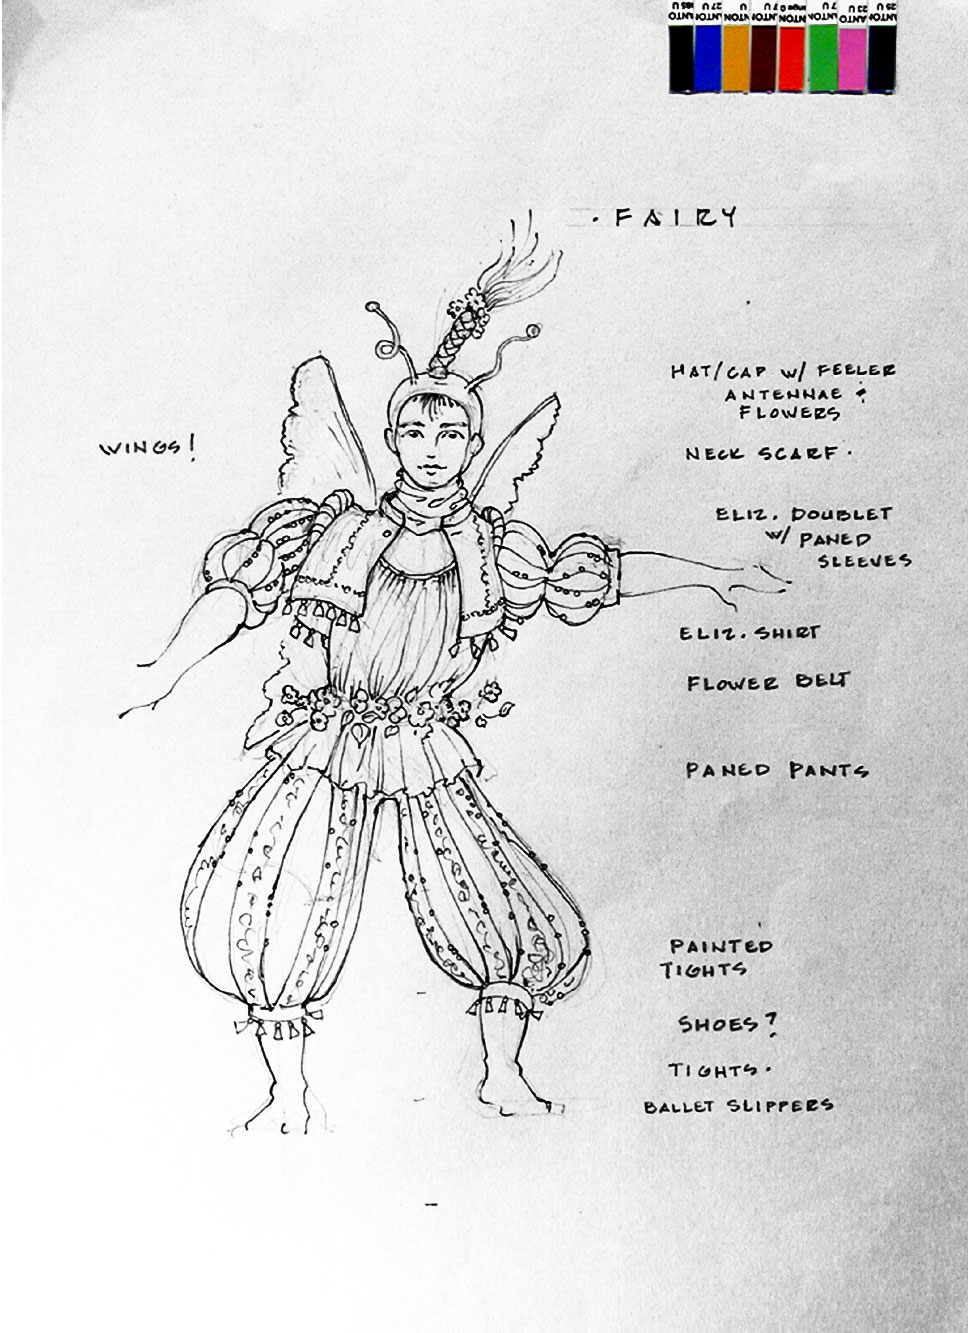 midsummer-nights-dream-fairy-wings-costume-design-michael-ganio.jpg